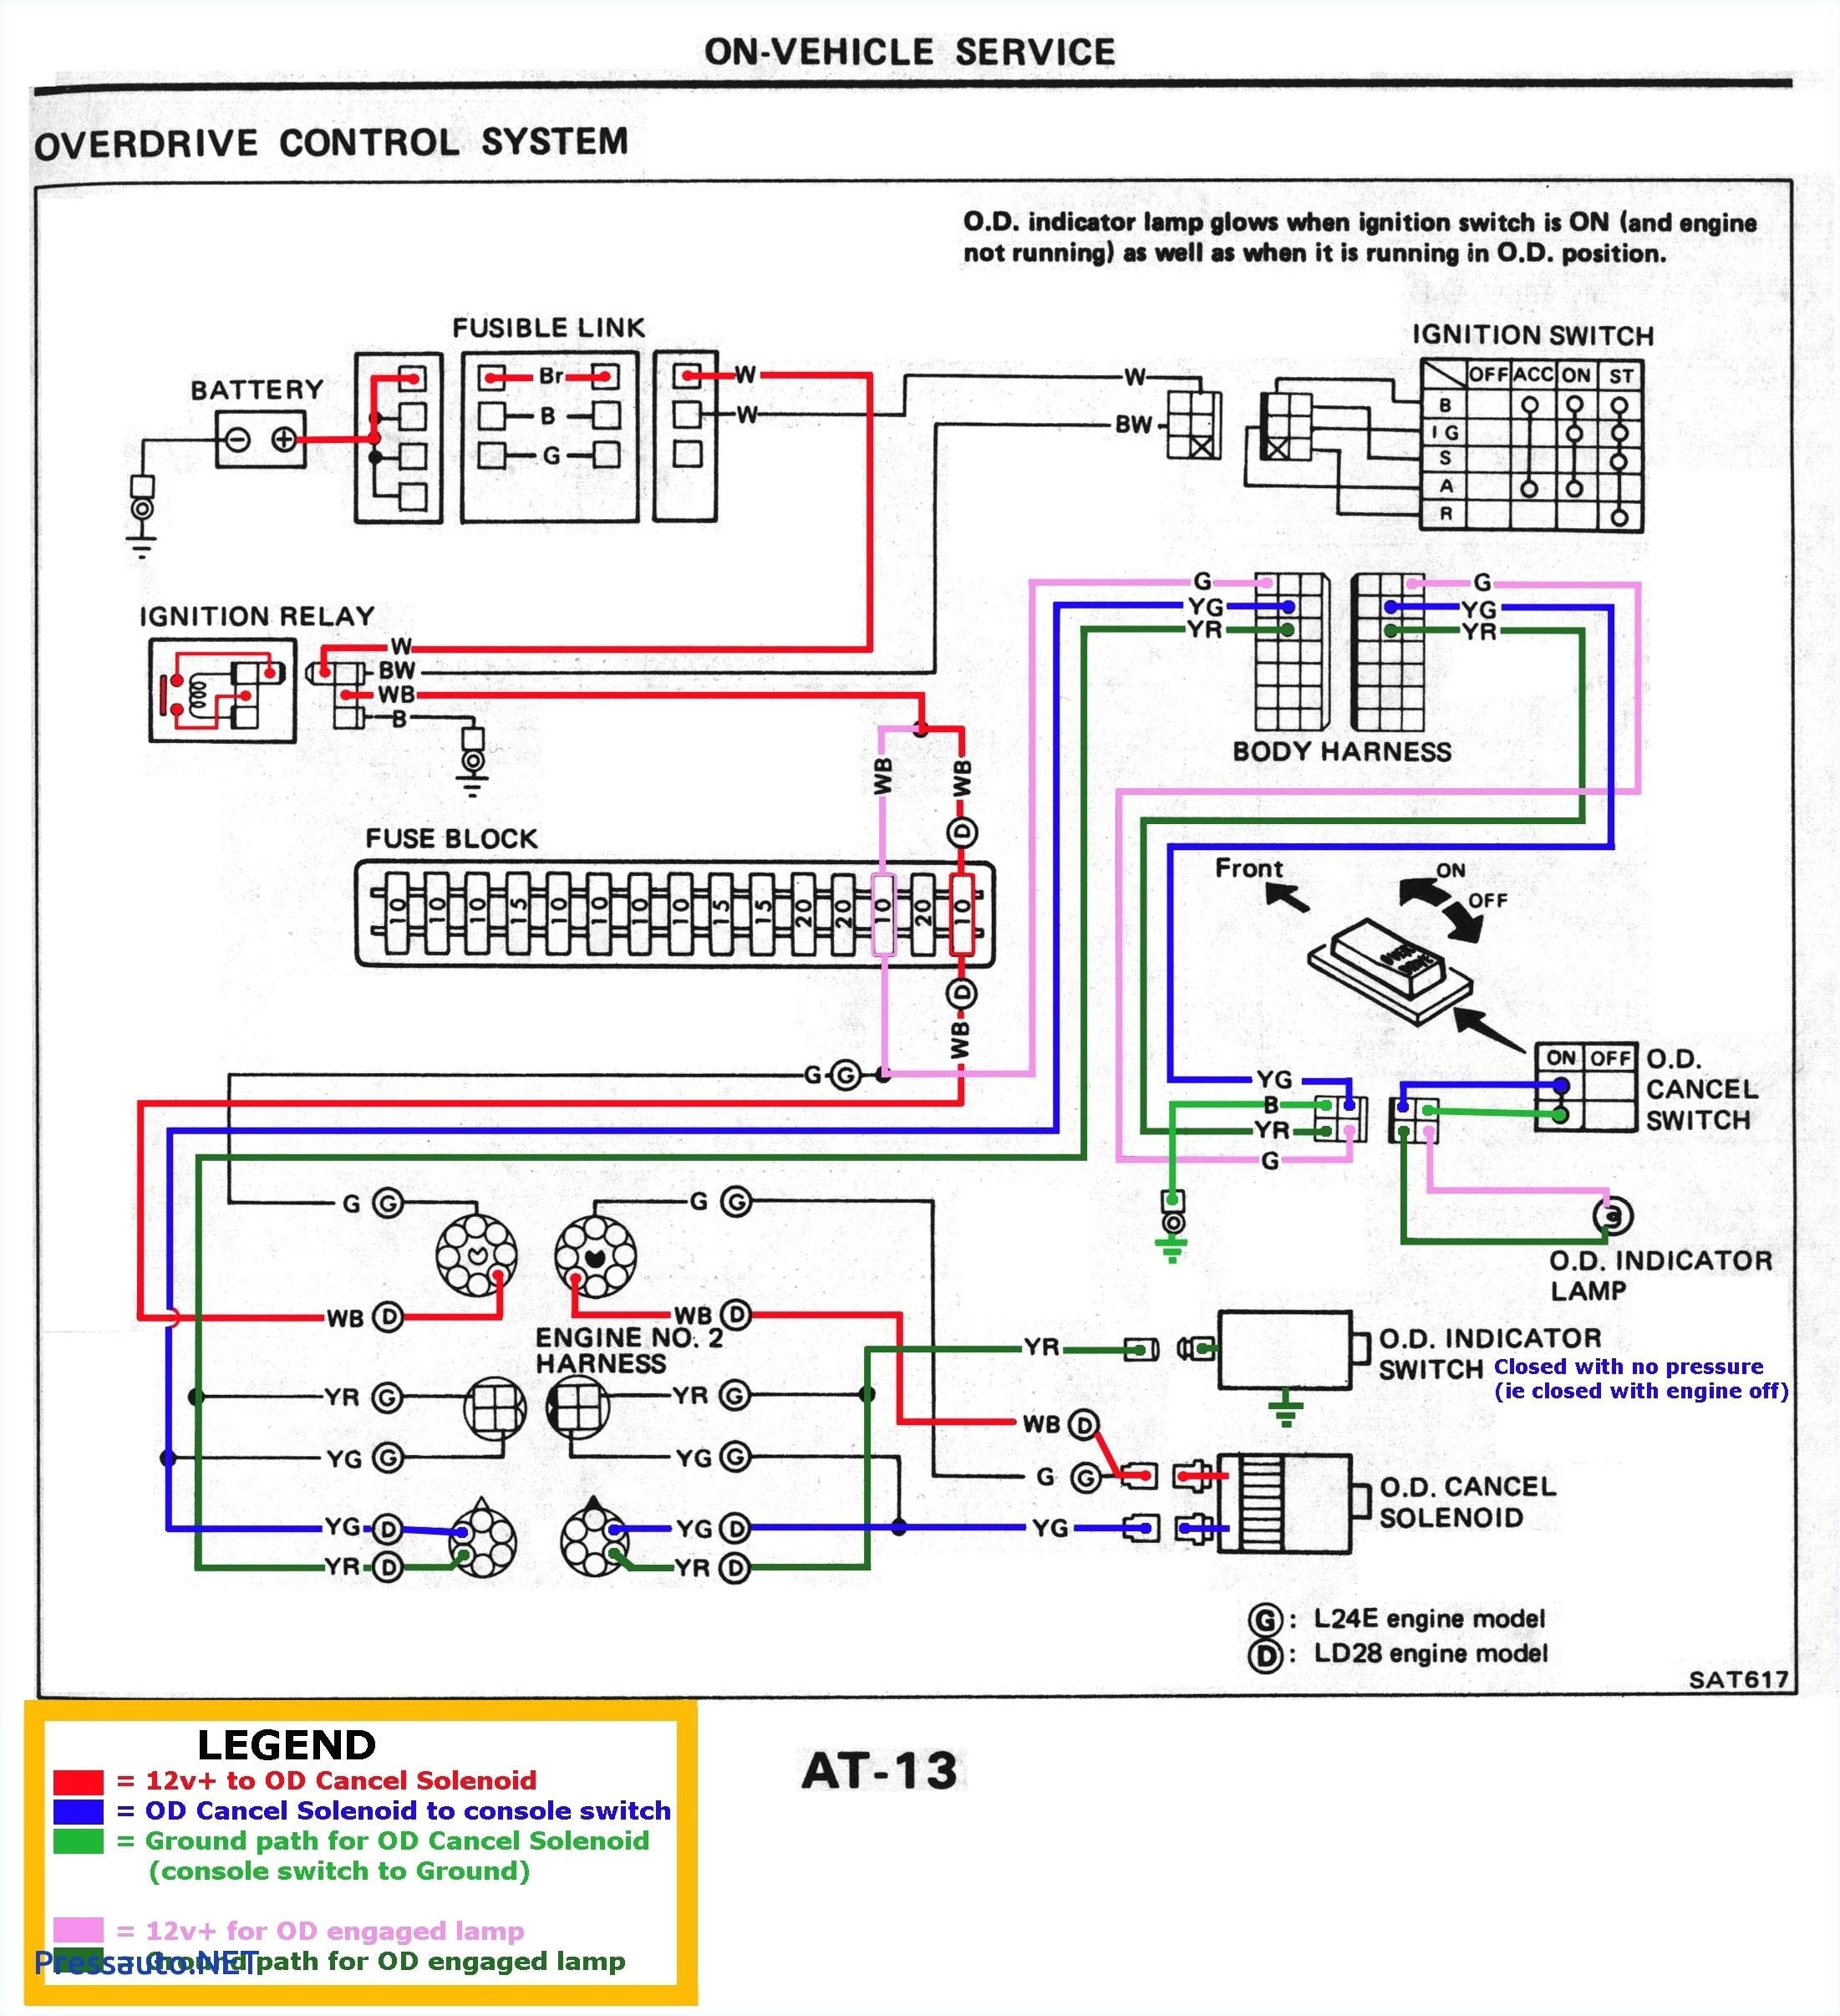 xbox external wiring diagram wiring diagram name xbox one wiring diagrams wiring diagram name xbox external